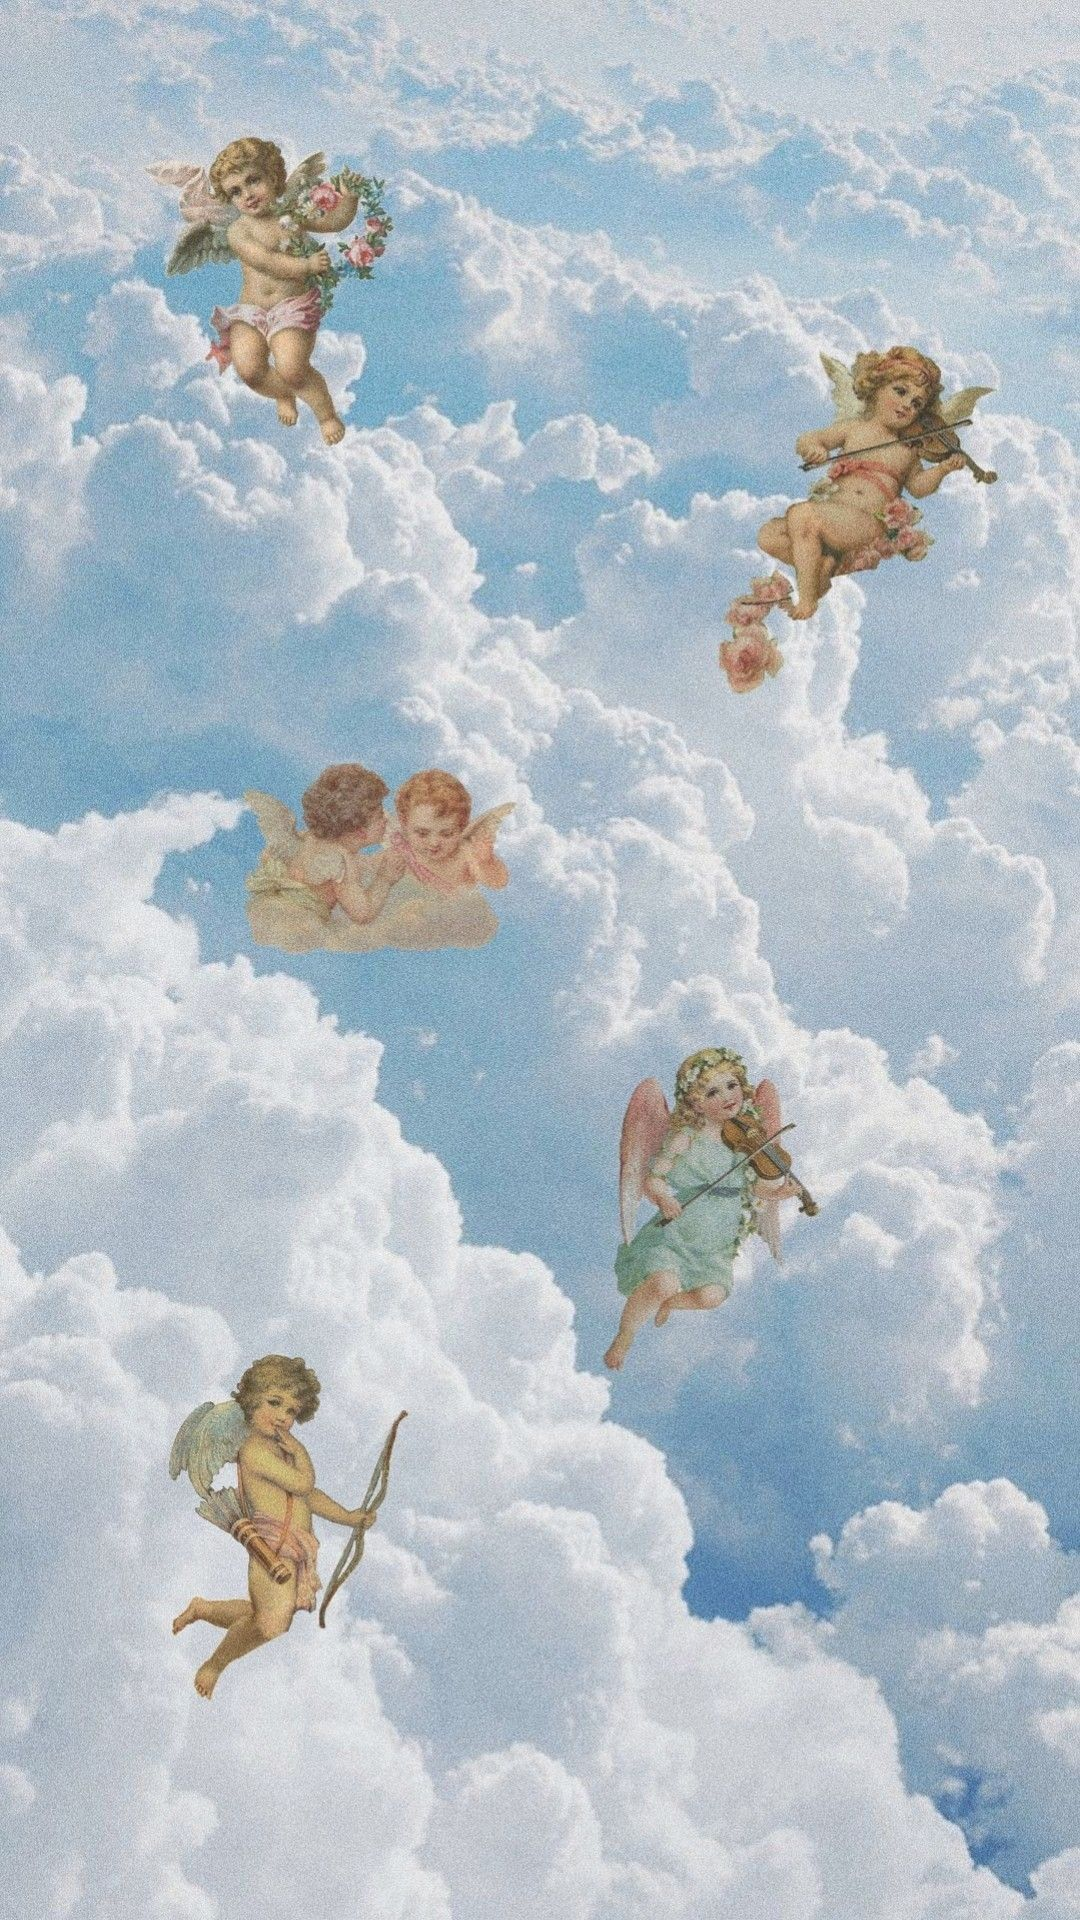 April on Twitter Angel wallpaper Aesthetic iphone wallpaper 1080x1920